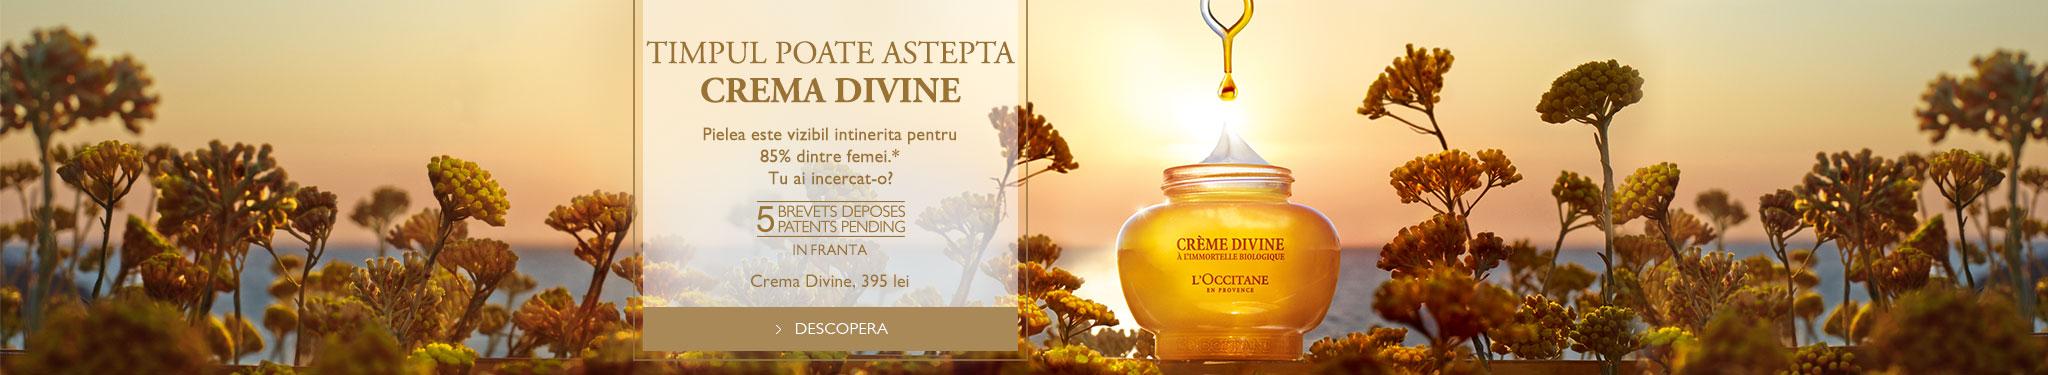 Crema Divine